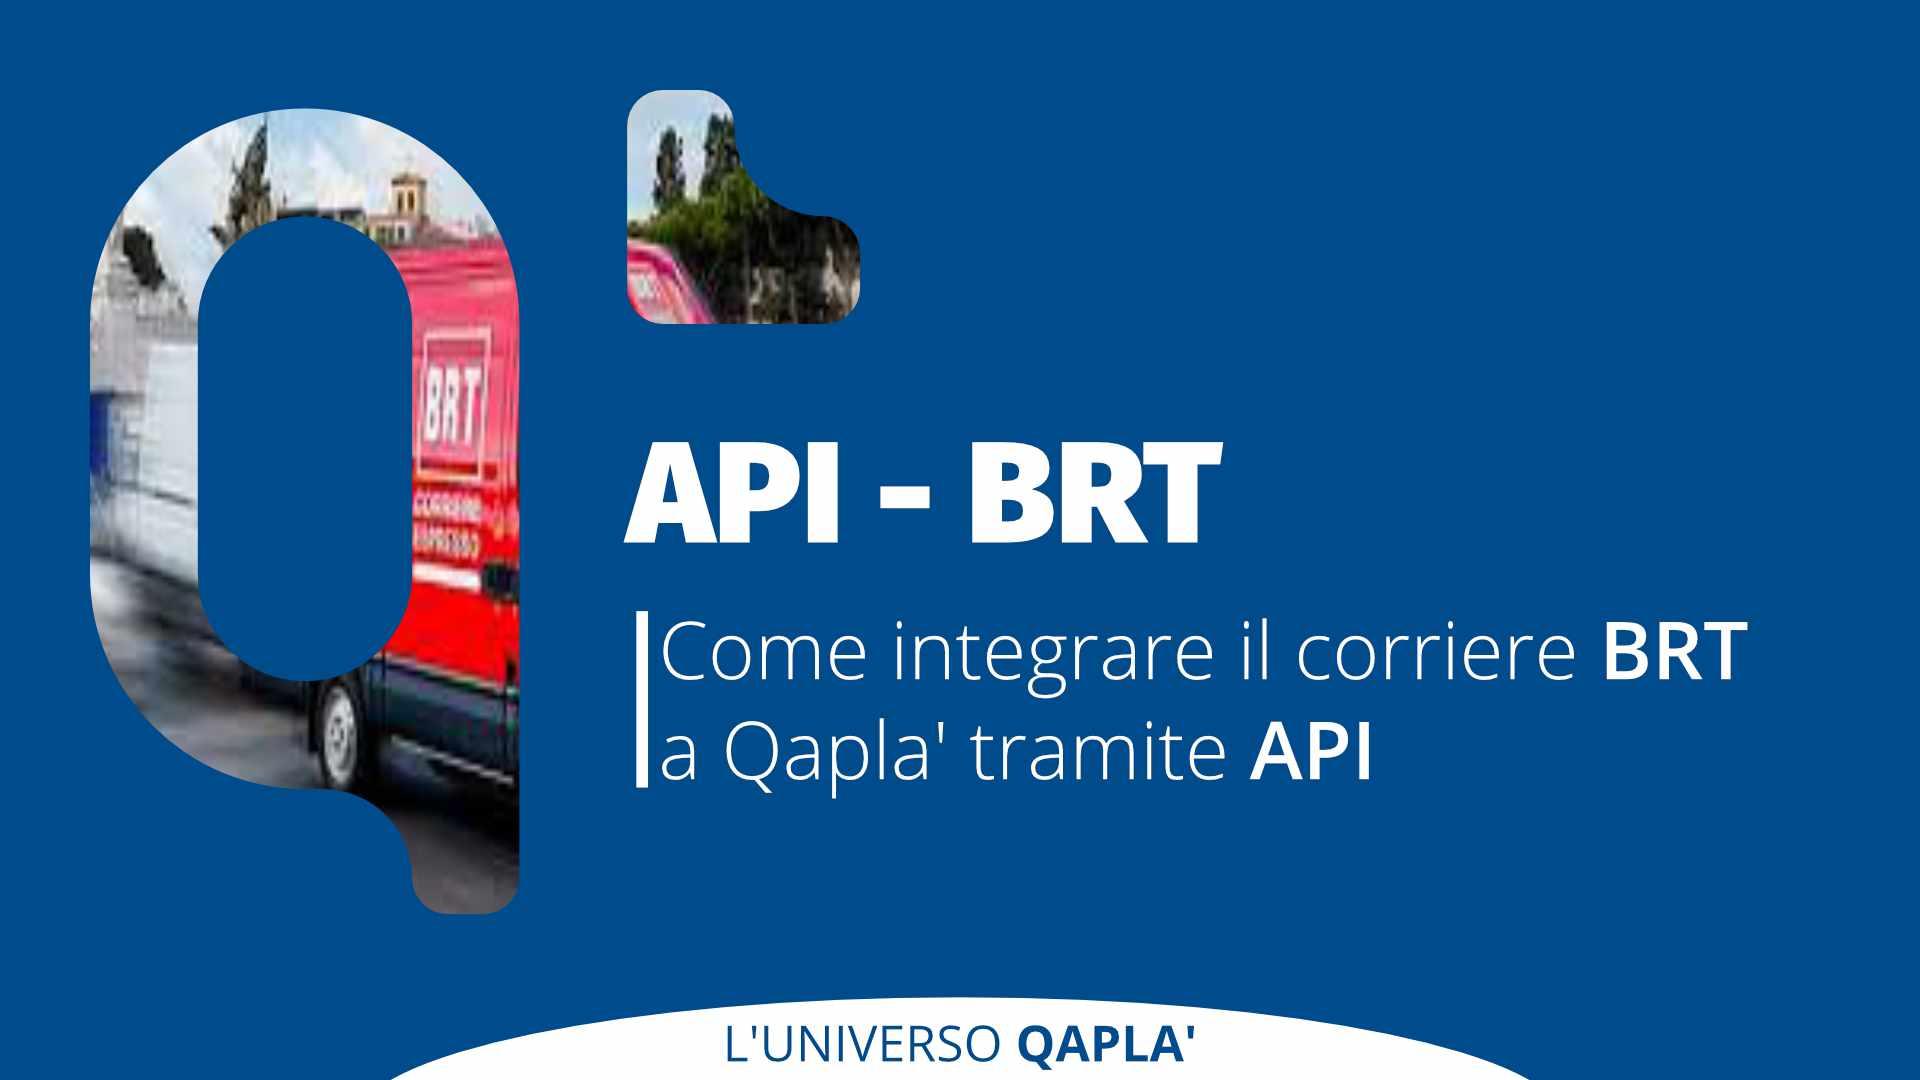 API BRT